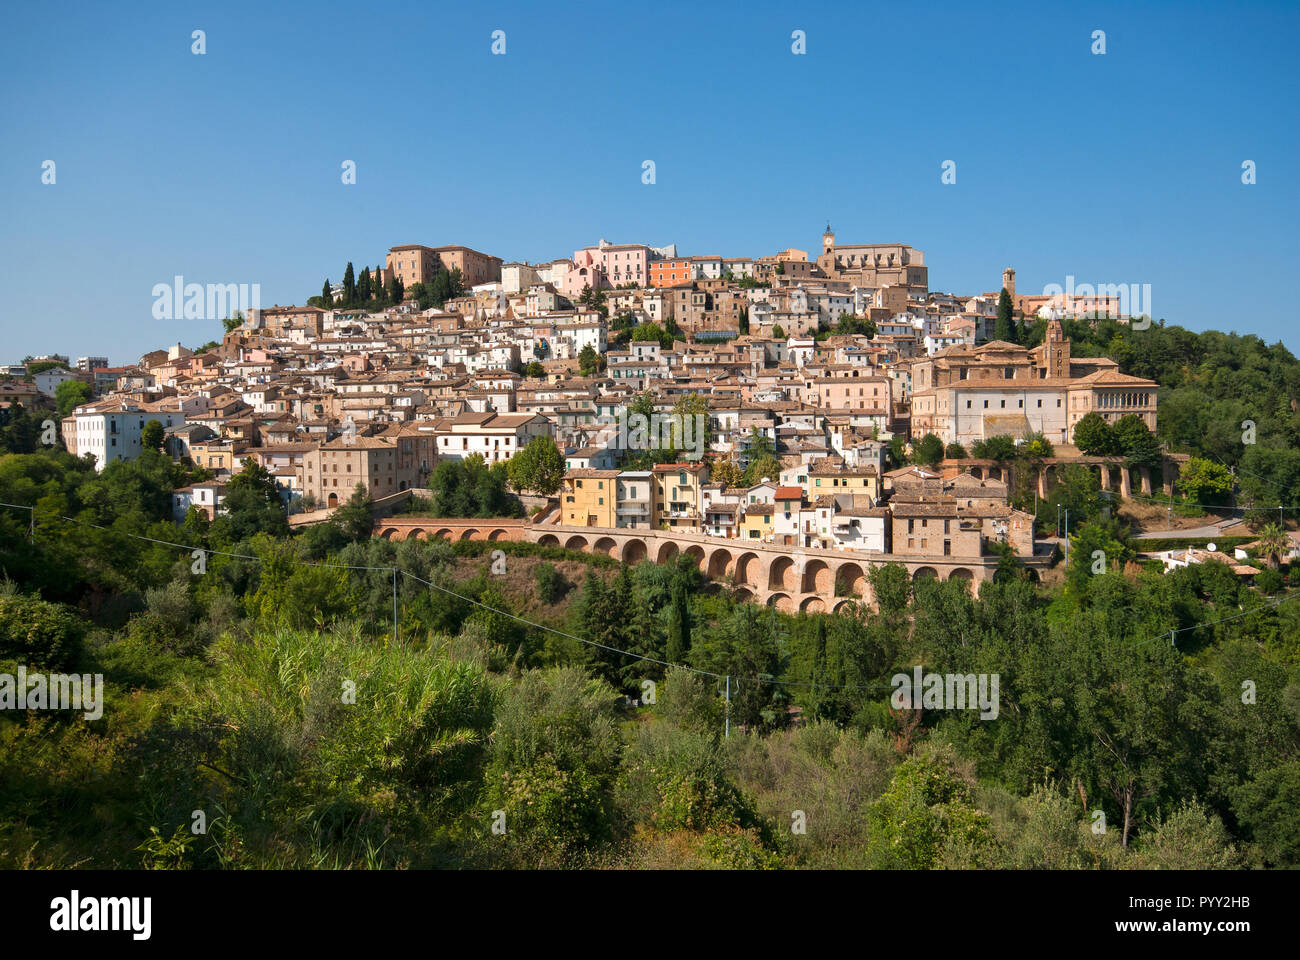 View of Loreto Aprutino, Abruzzo, Italy - Stock Image